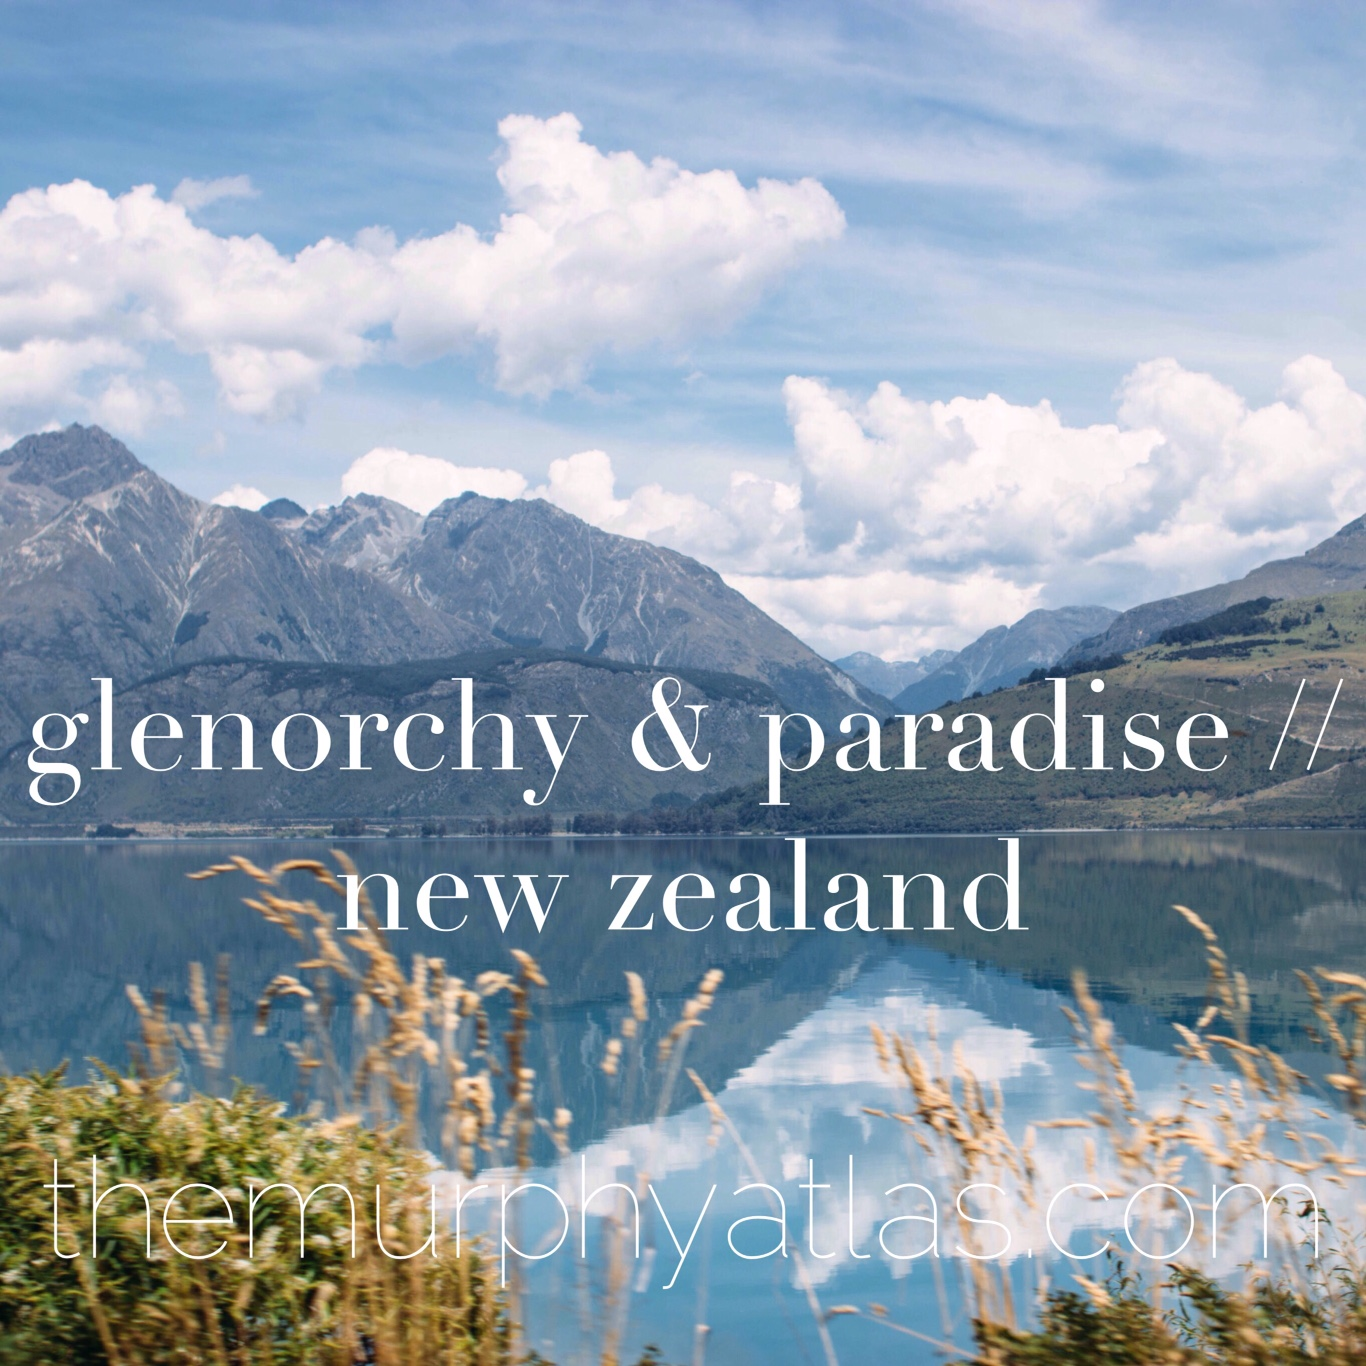 Glenorchy & Paradise // New Zealand - The Murphy Atlas